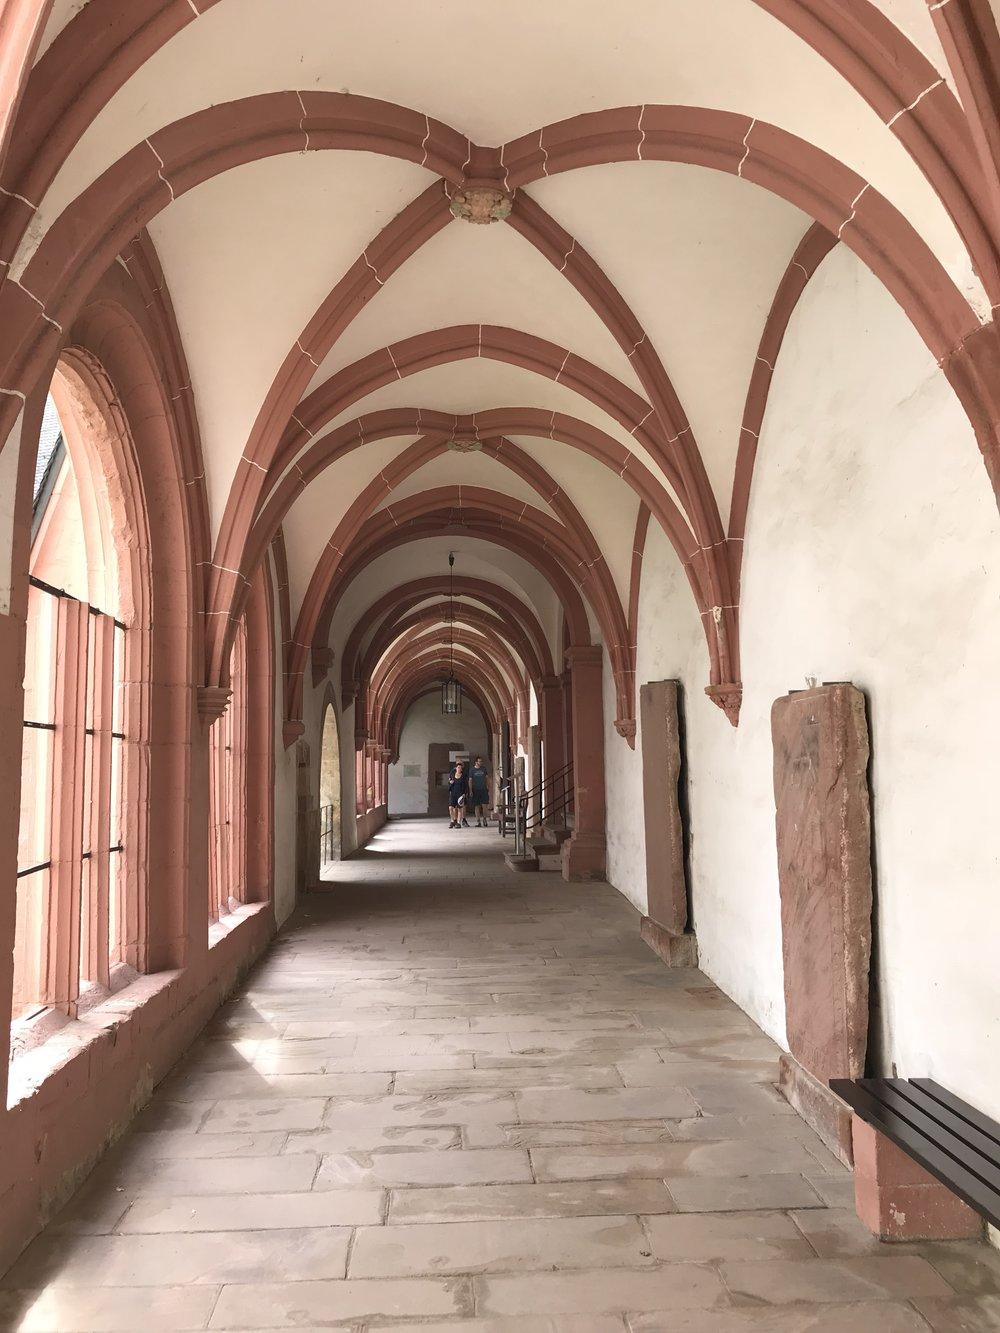 Kloster Eberbach hallway.jpg